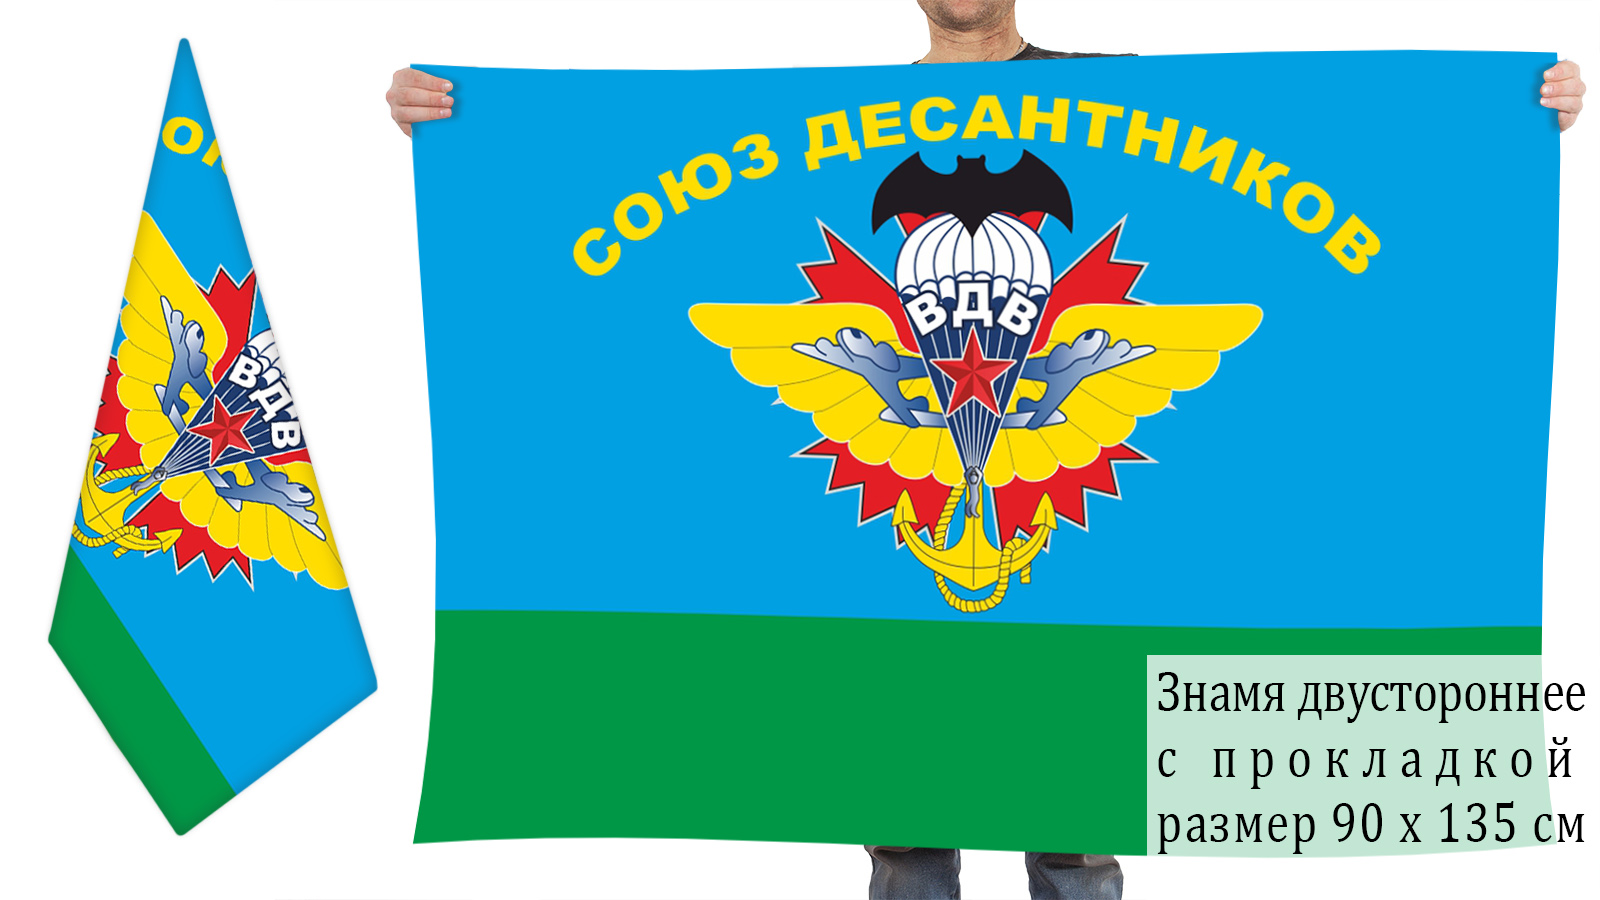 Двусторонний флаг союза всех десантников России